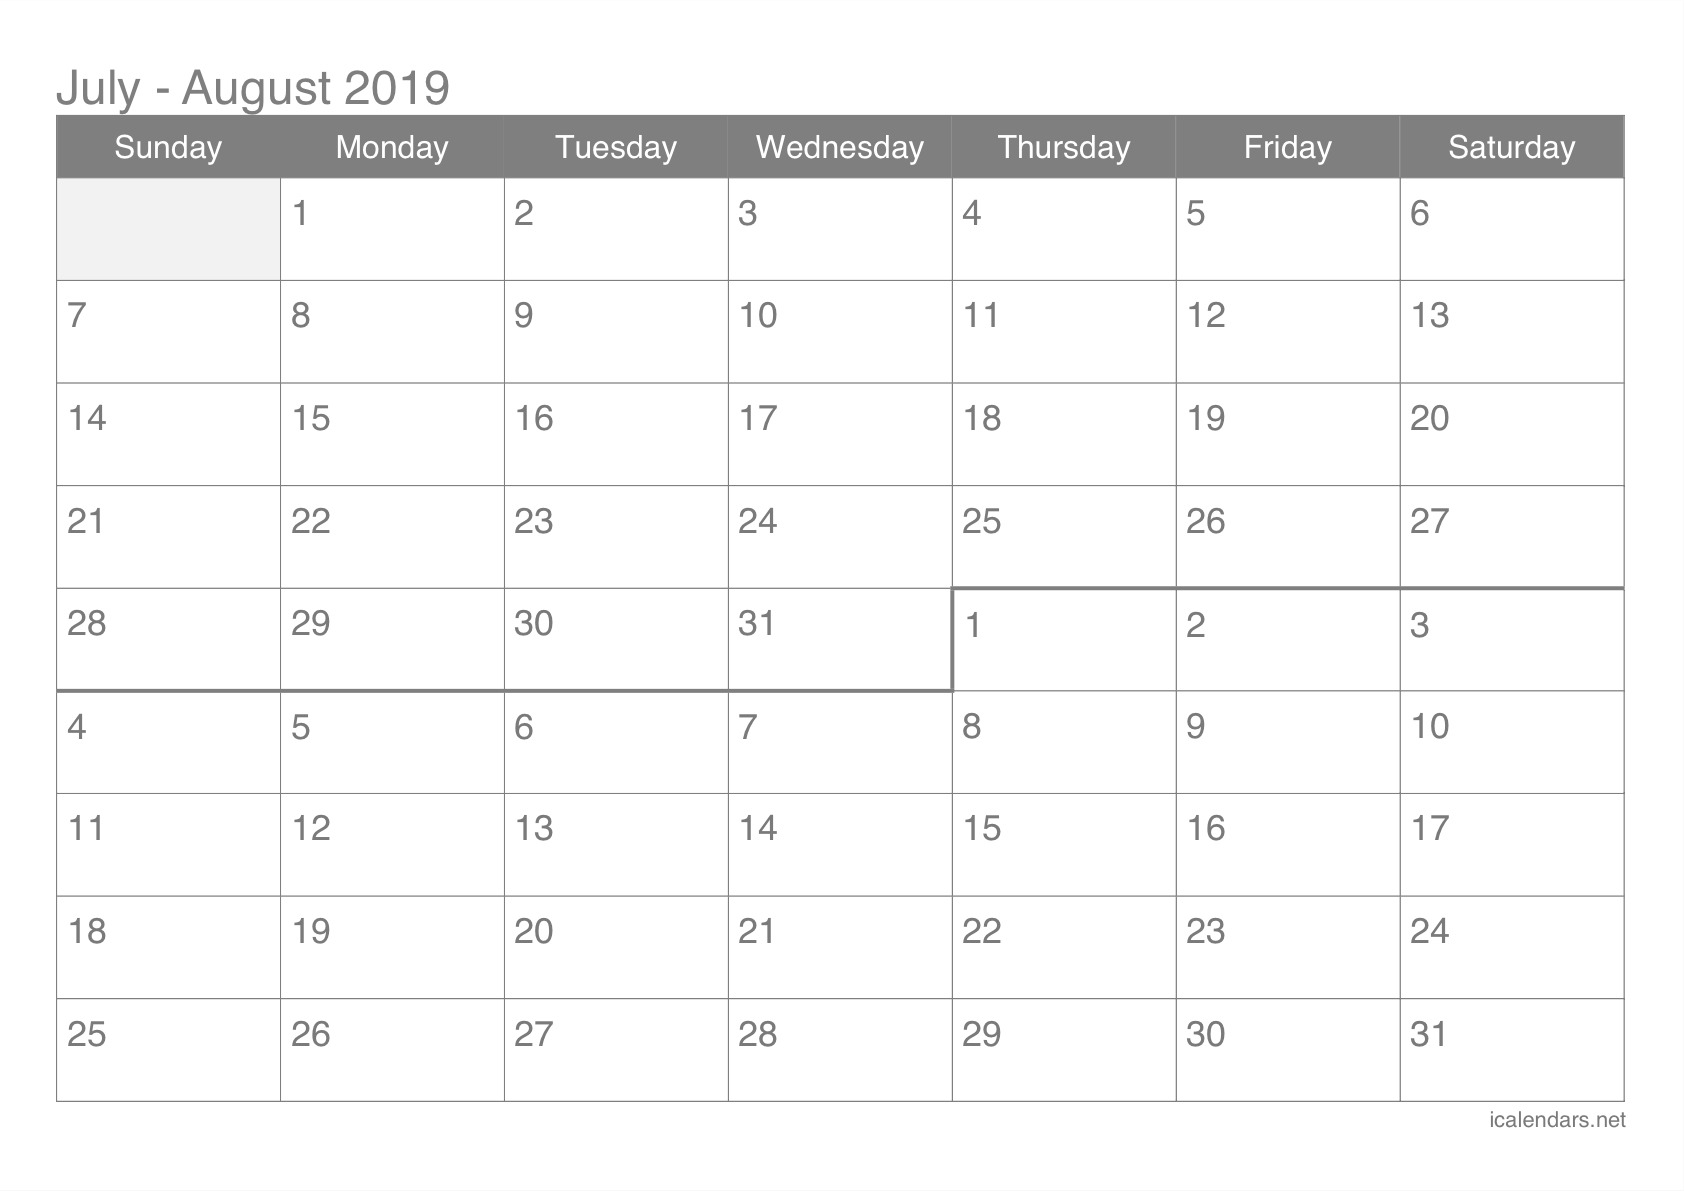 July And August 2019 Printable Calendar – Icalendars Calendar Of 2019 July